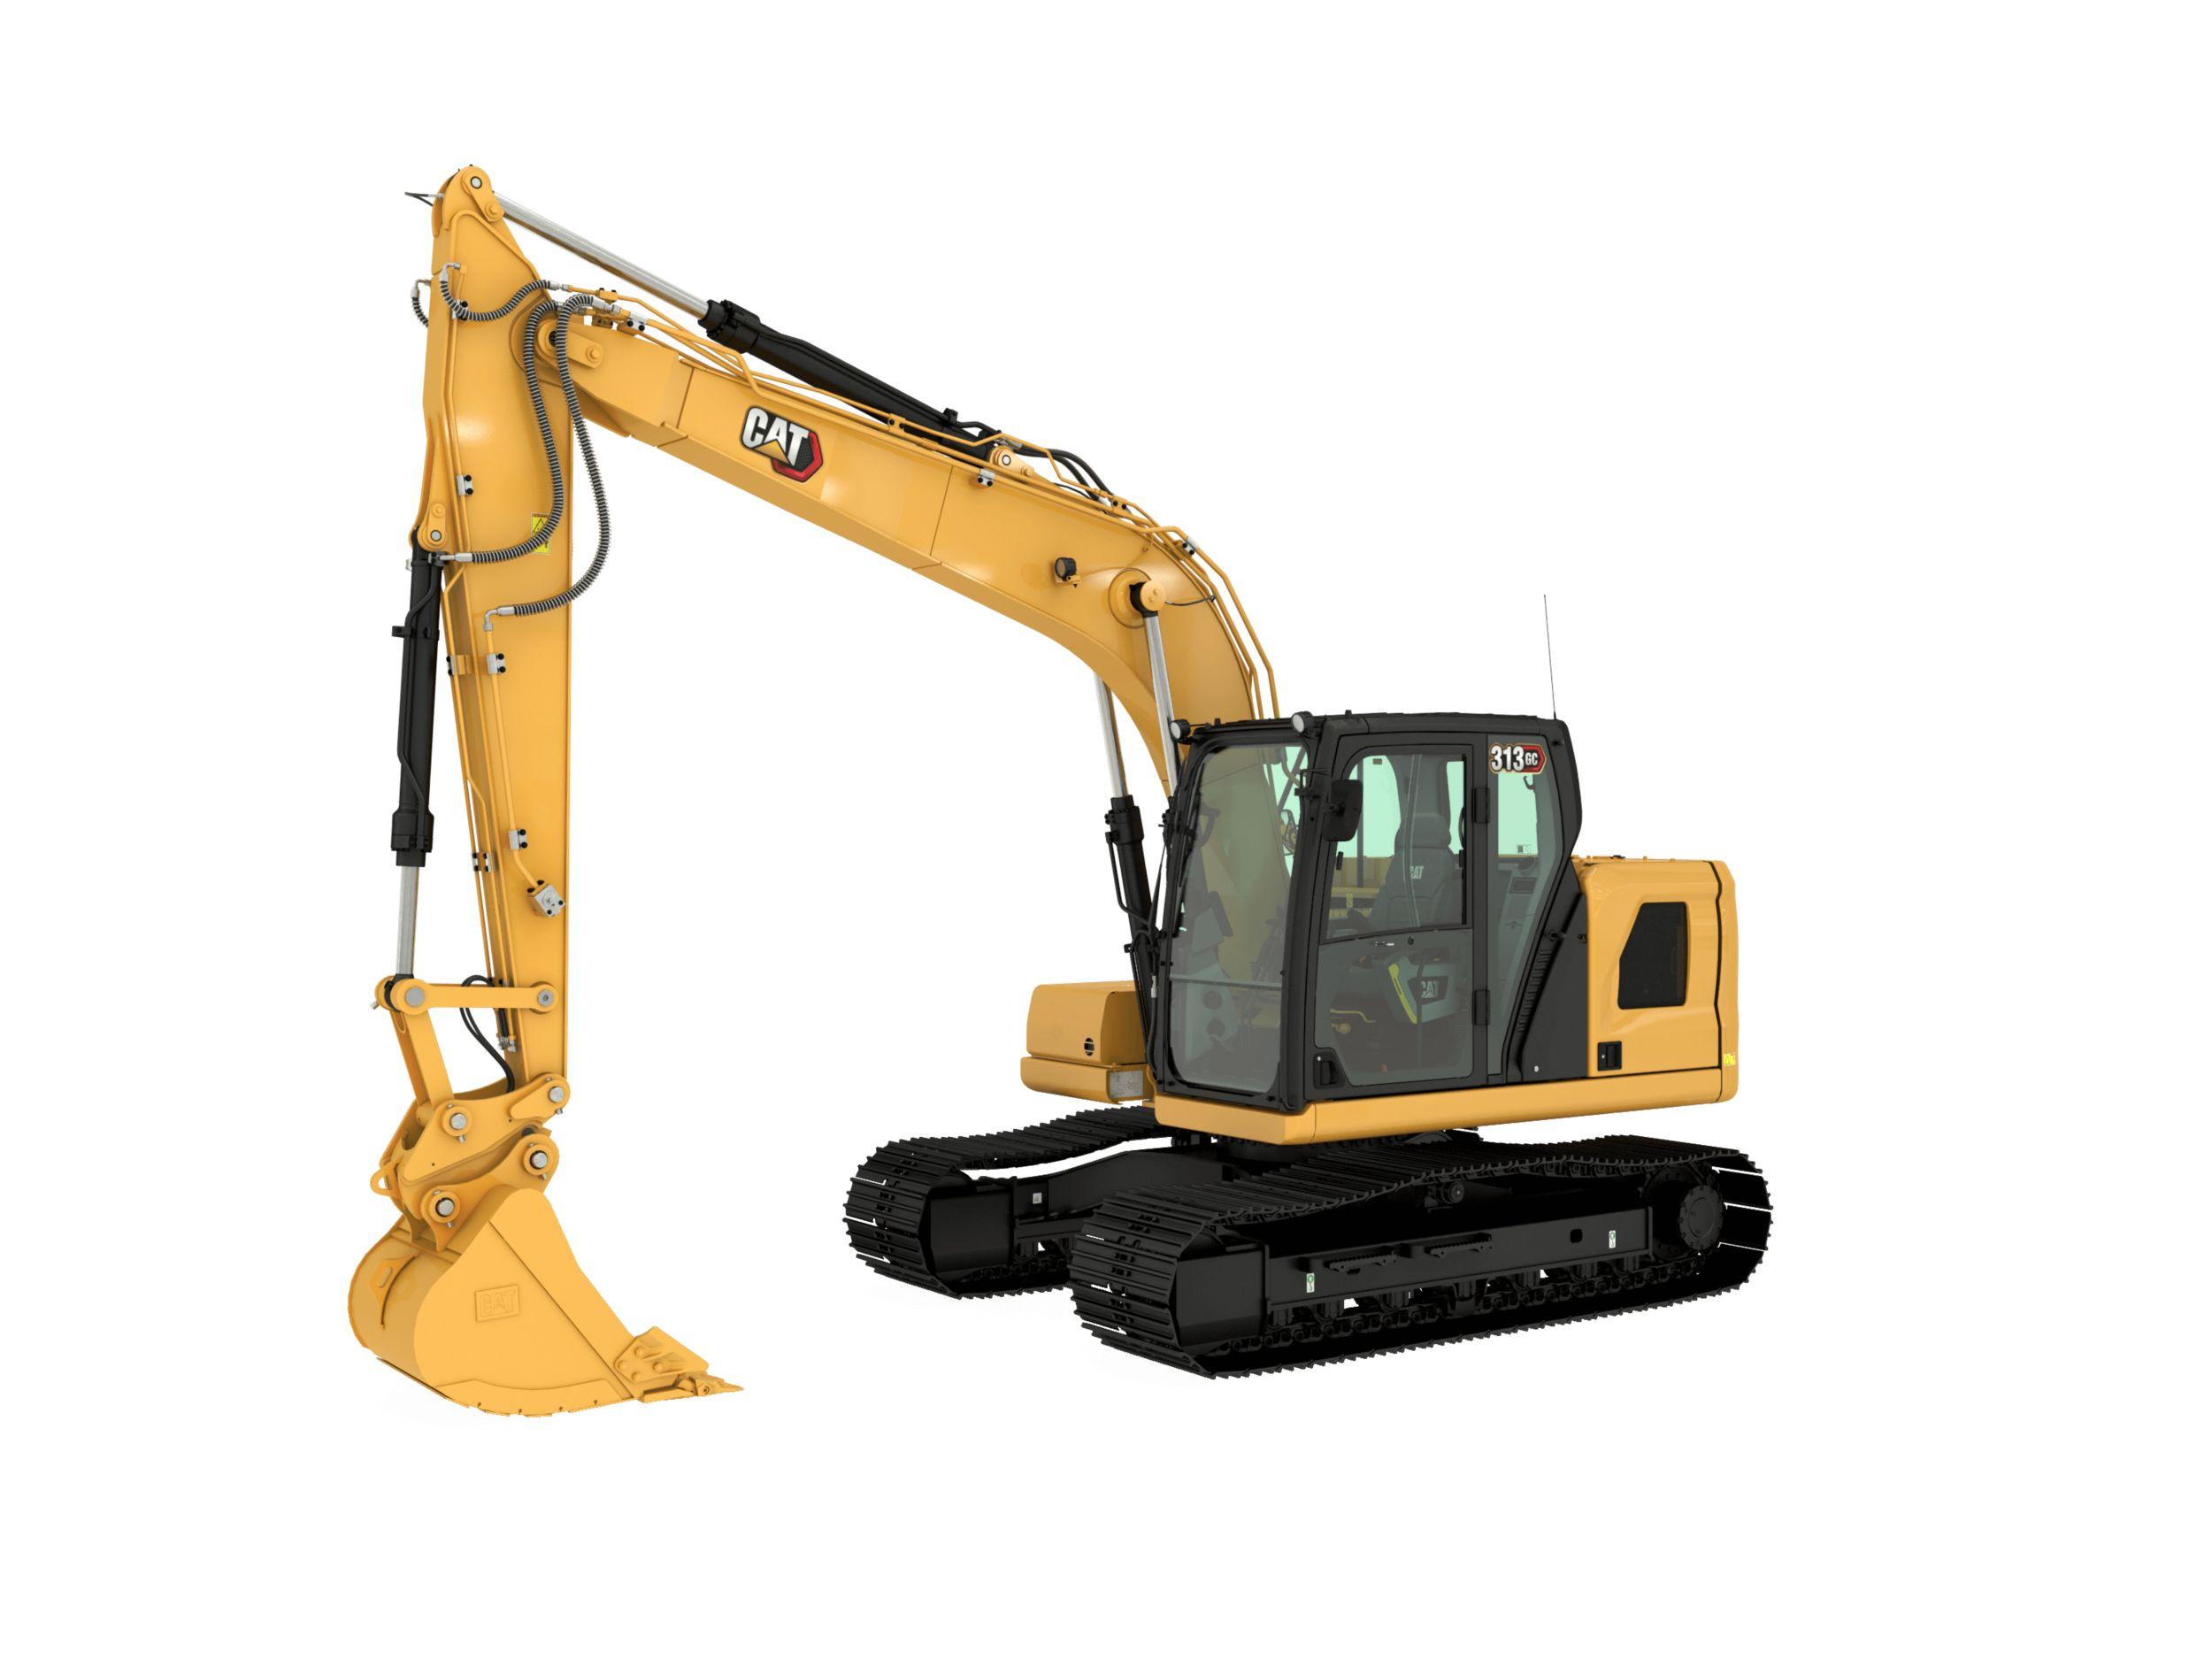 313 GC Hydraulic Excavator